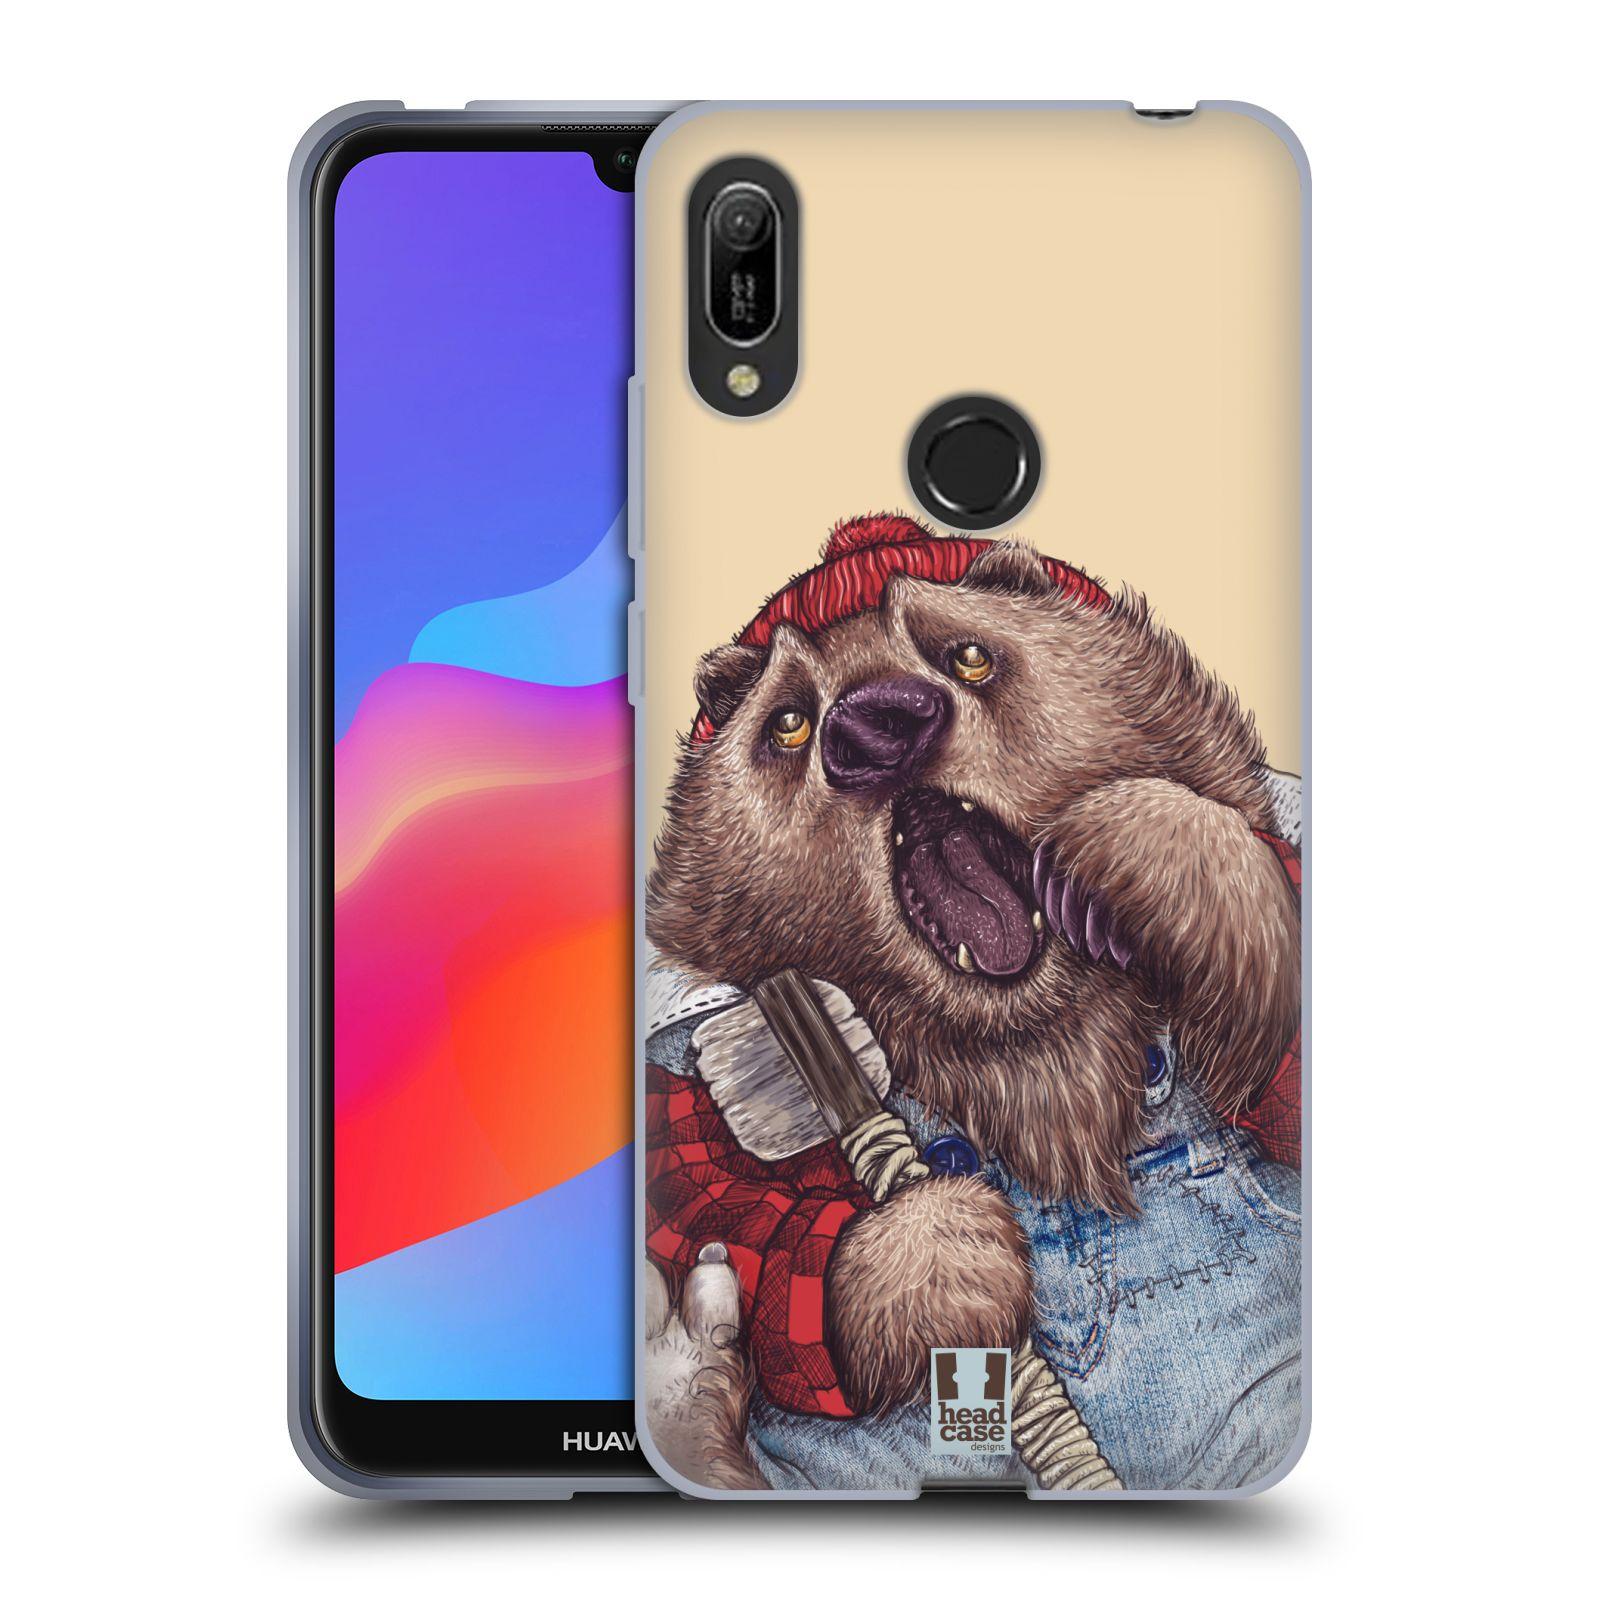 Silikonové pouzdro na mobil Huawei Y6 (2019) - Head Case - ANIMPLA MEDVĚD